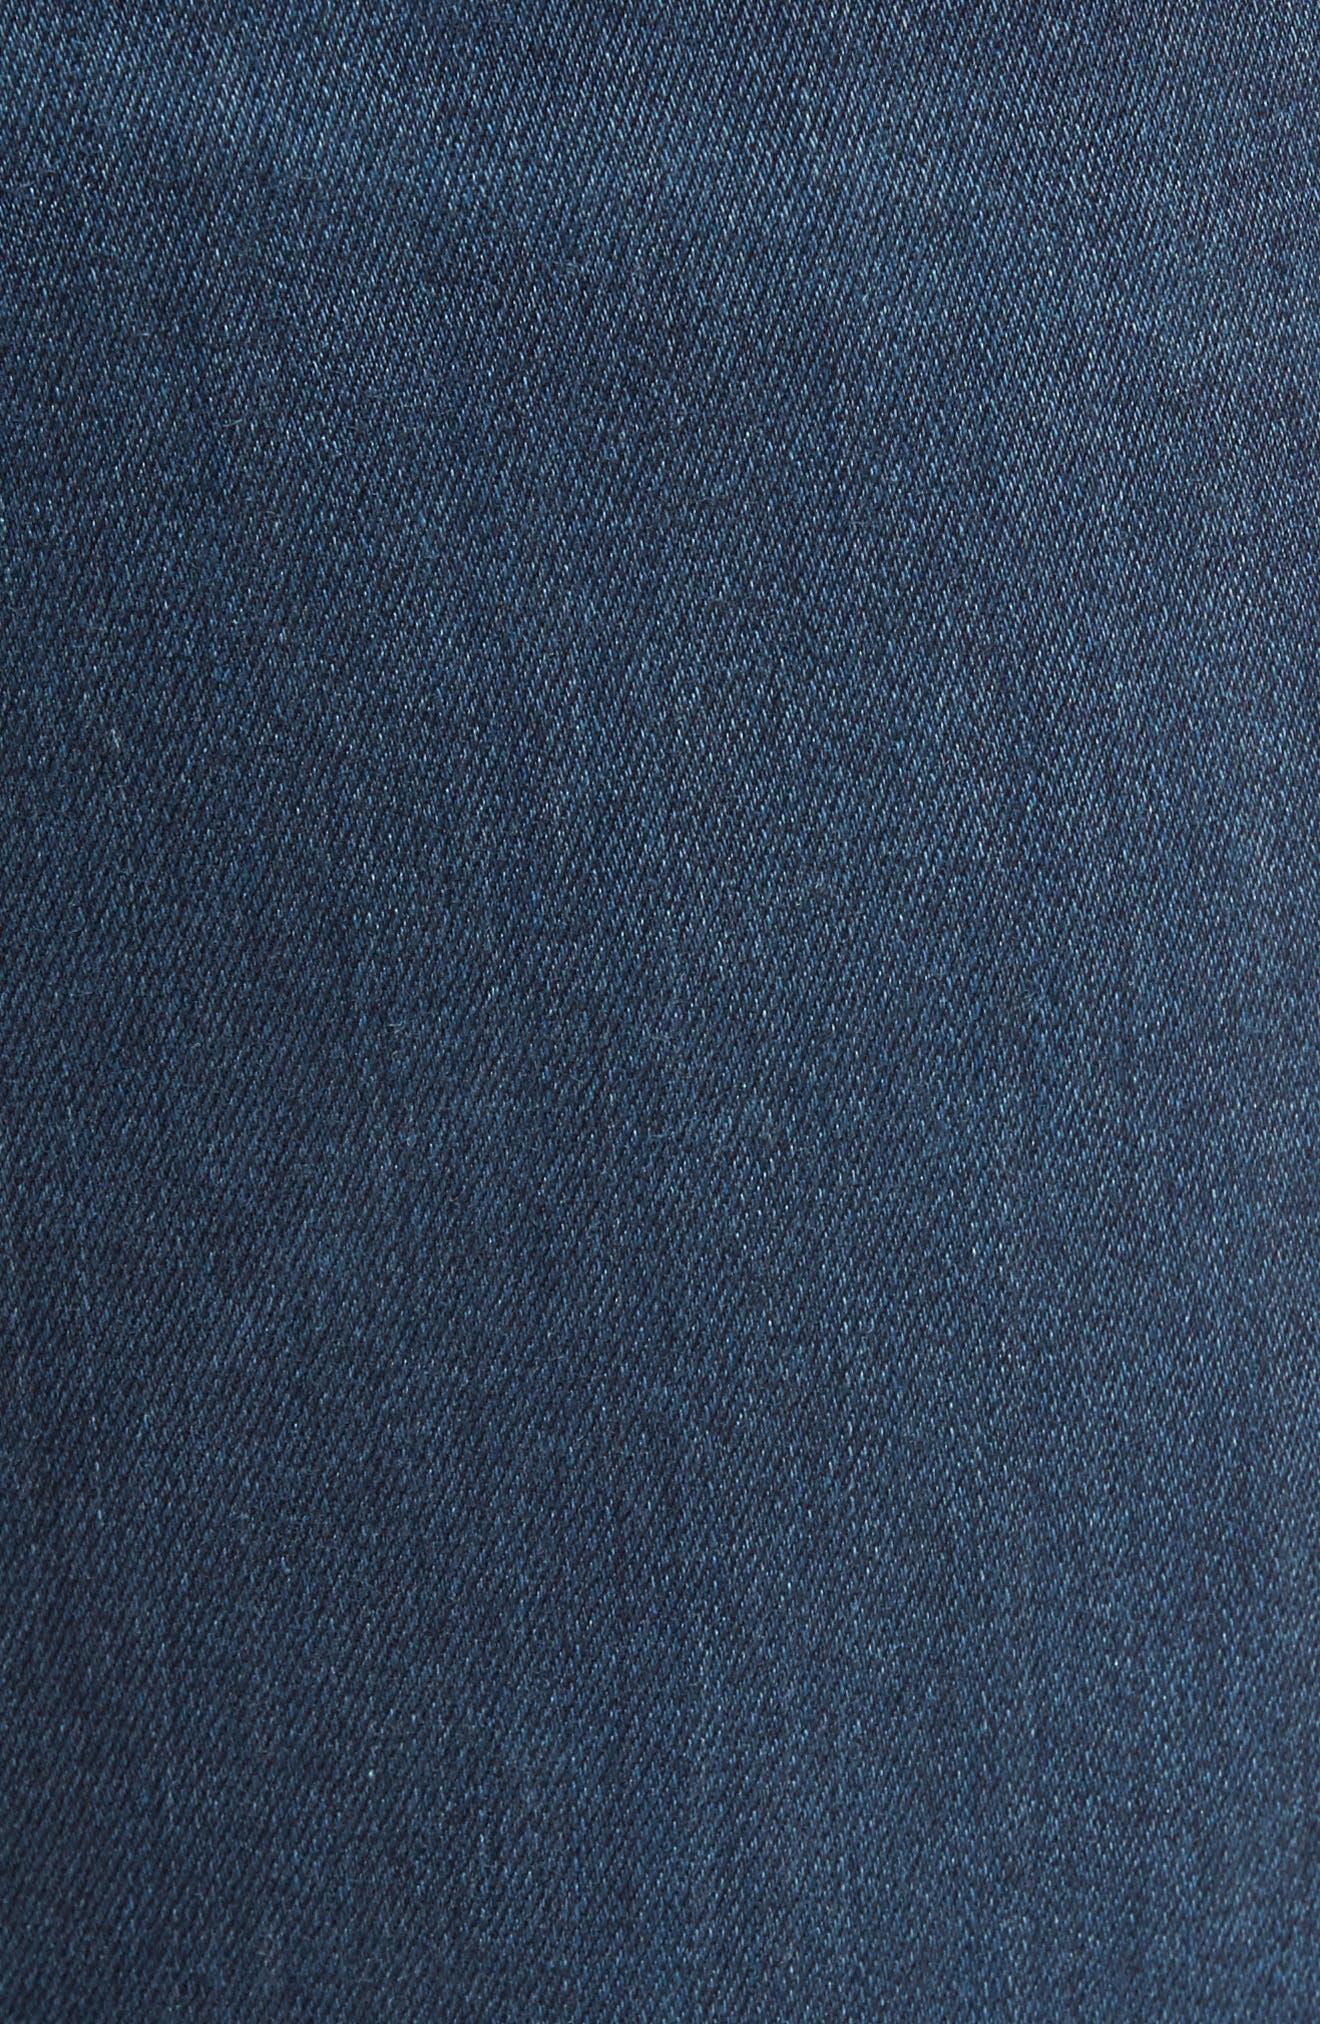 Transcend - Federal Slim Straight Fit Jeans,                             Alternate thumbnail 5, color,                             400